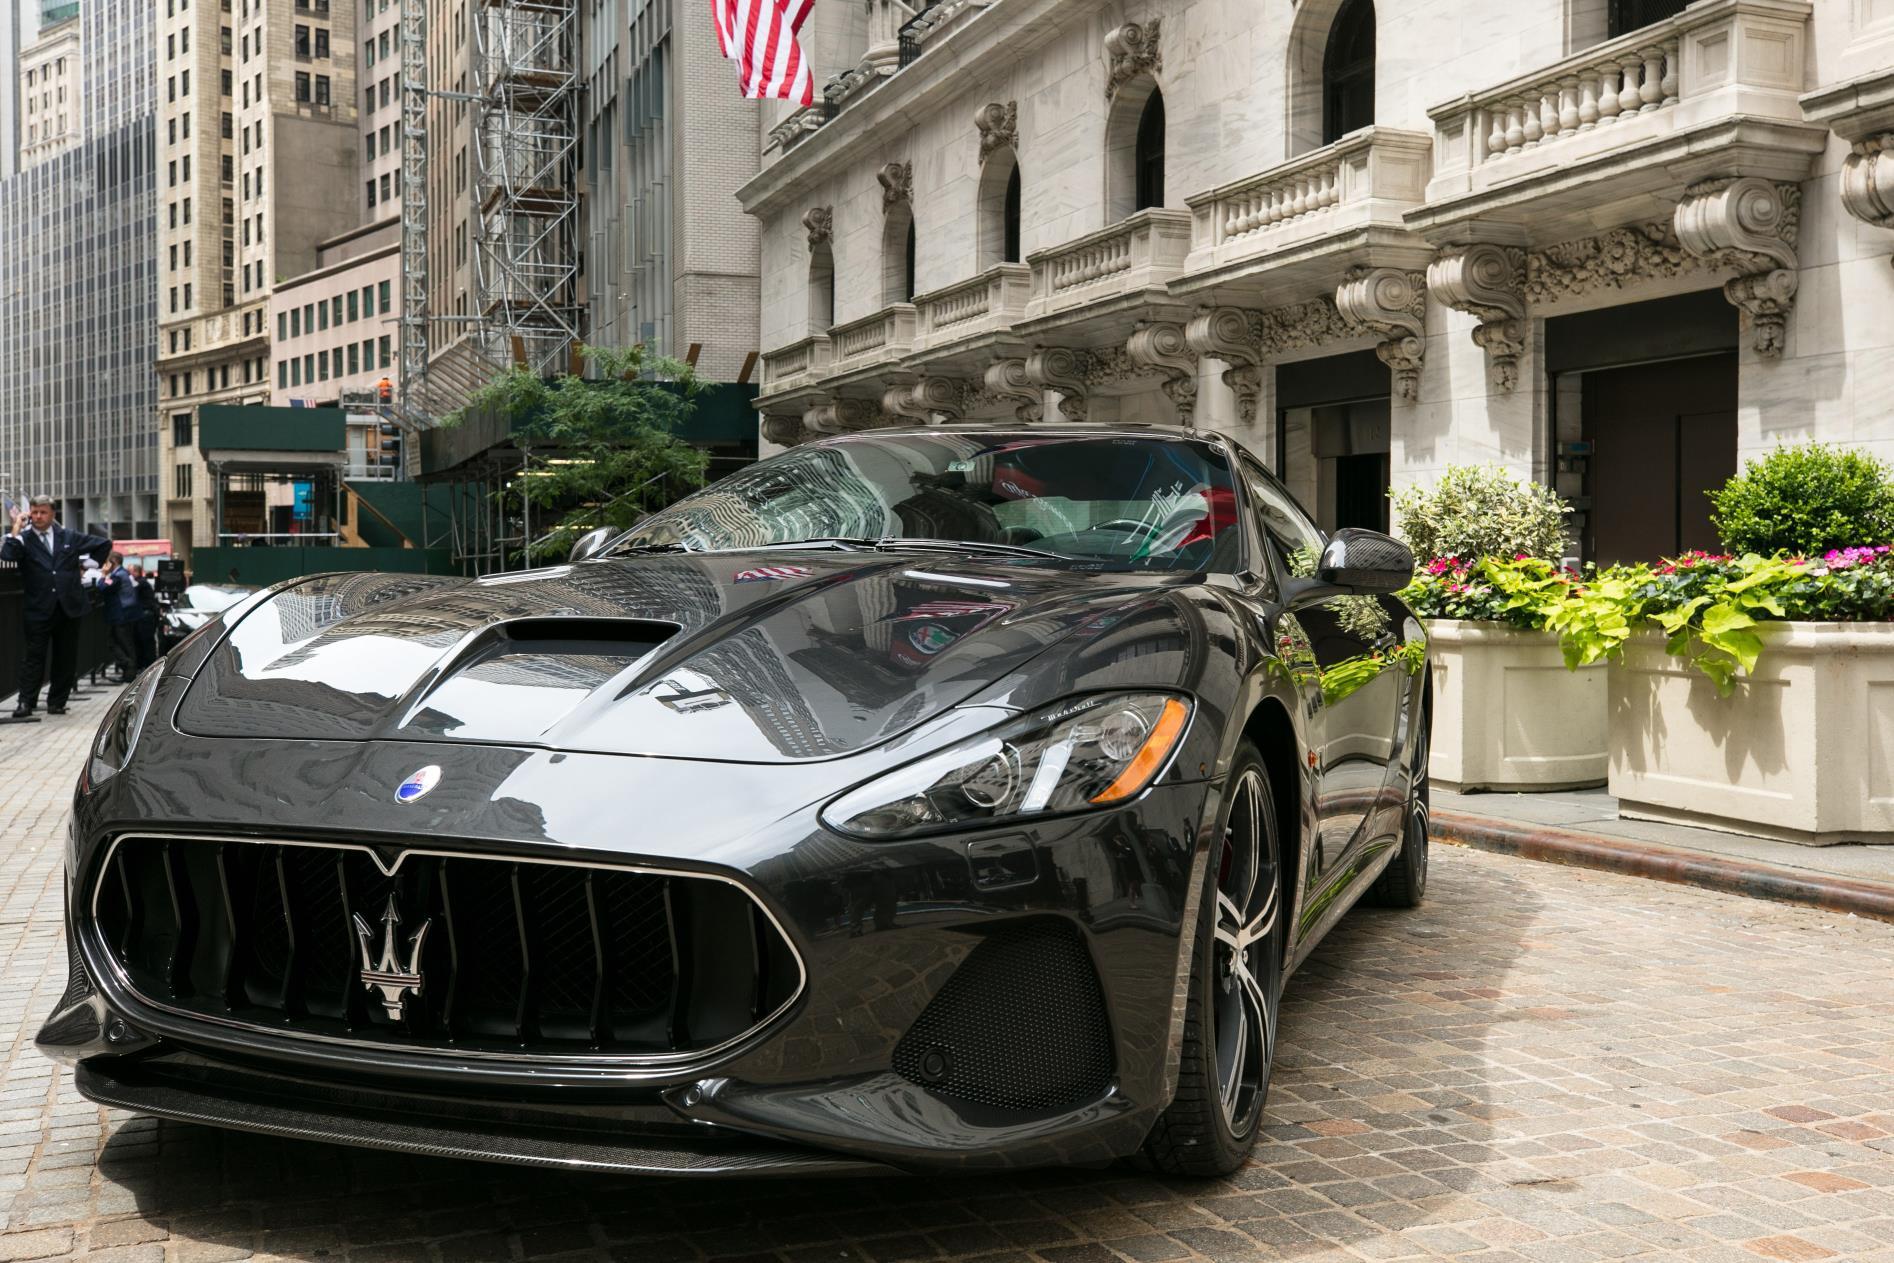 2018 Maserati GranTurismo 2018 Maserati GranTurismo